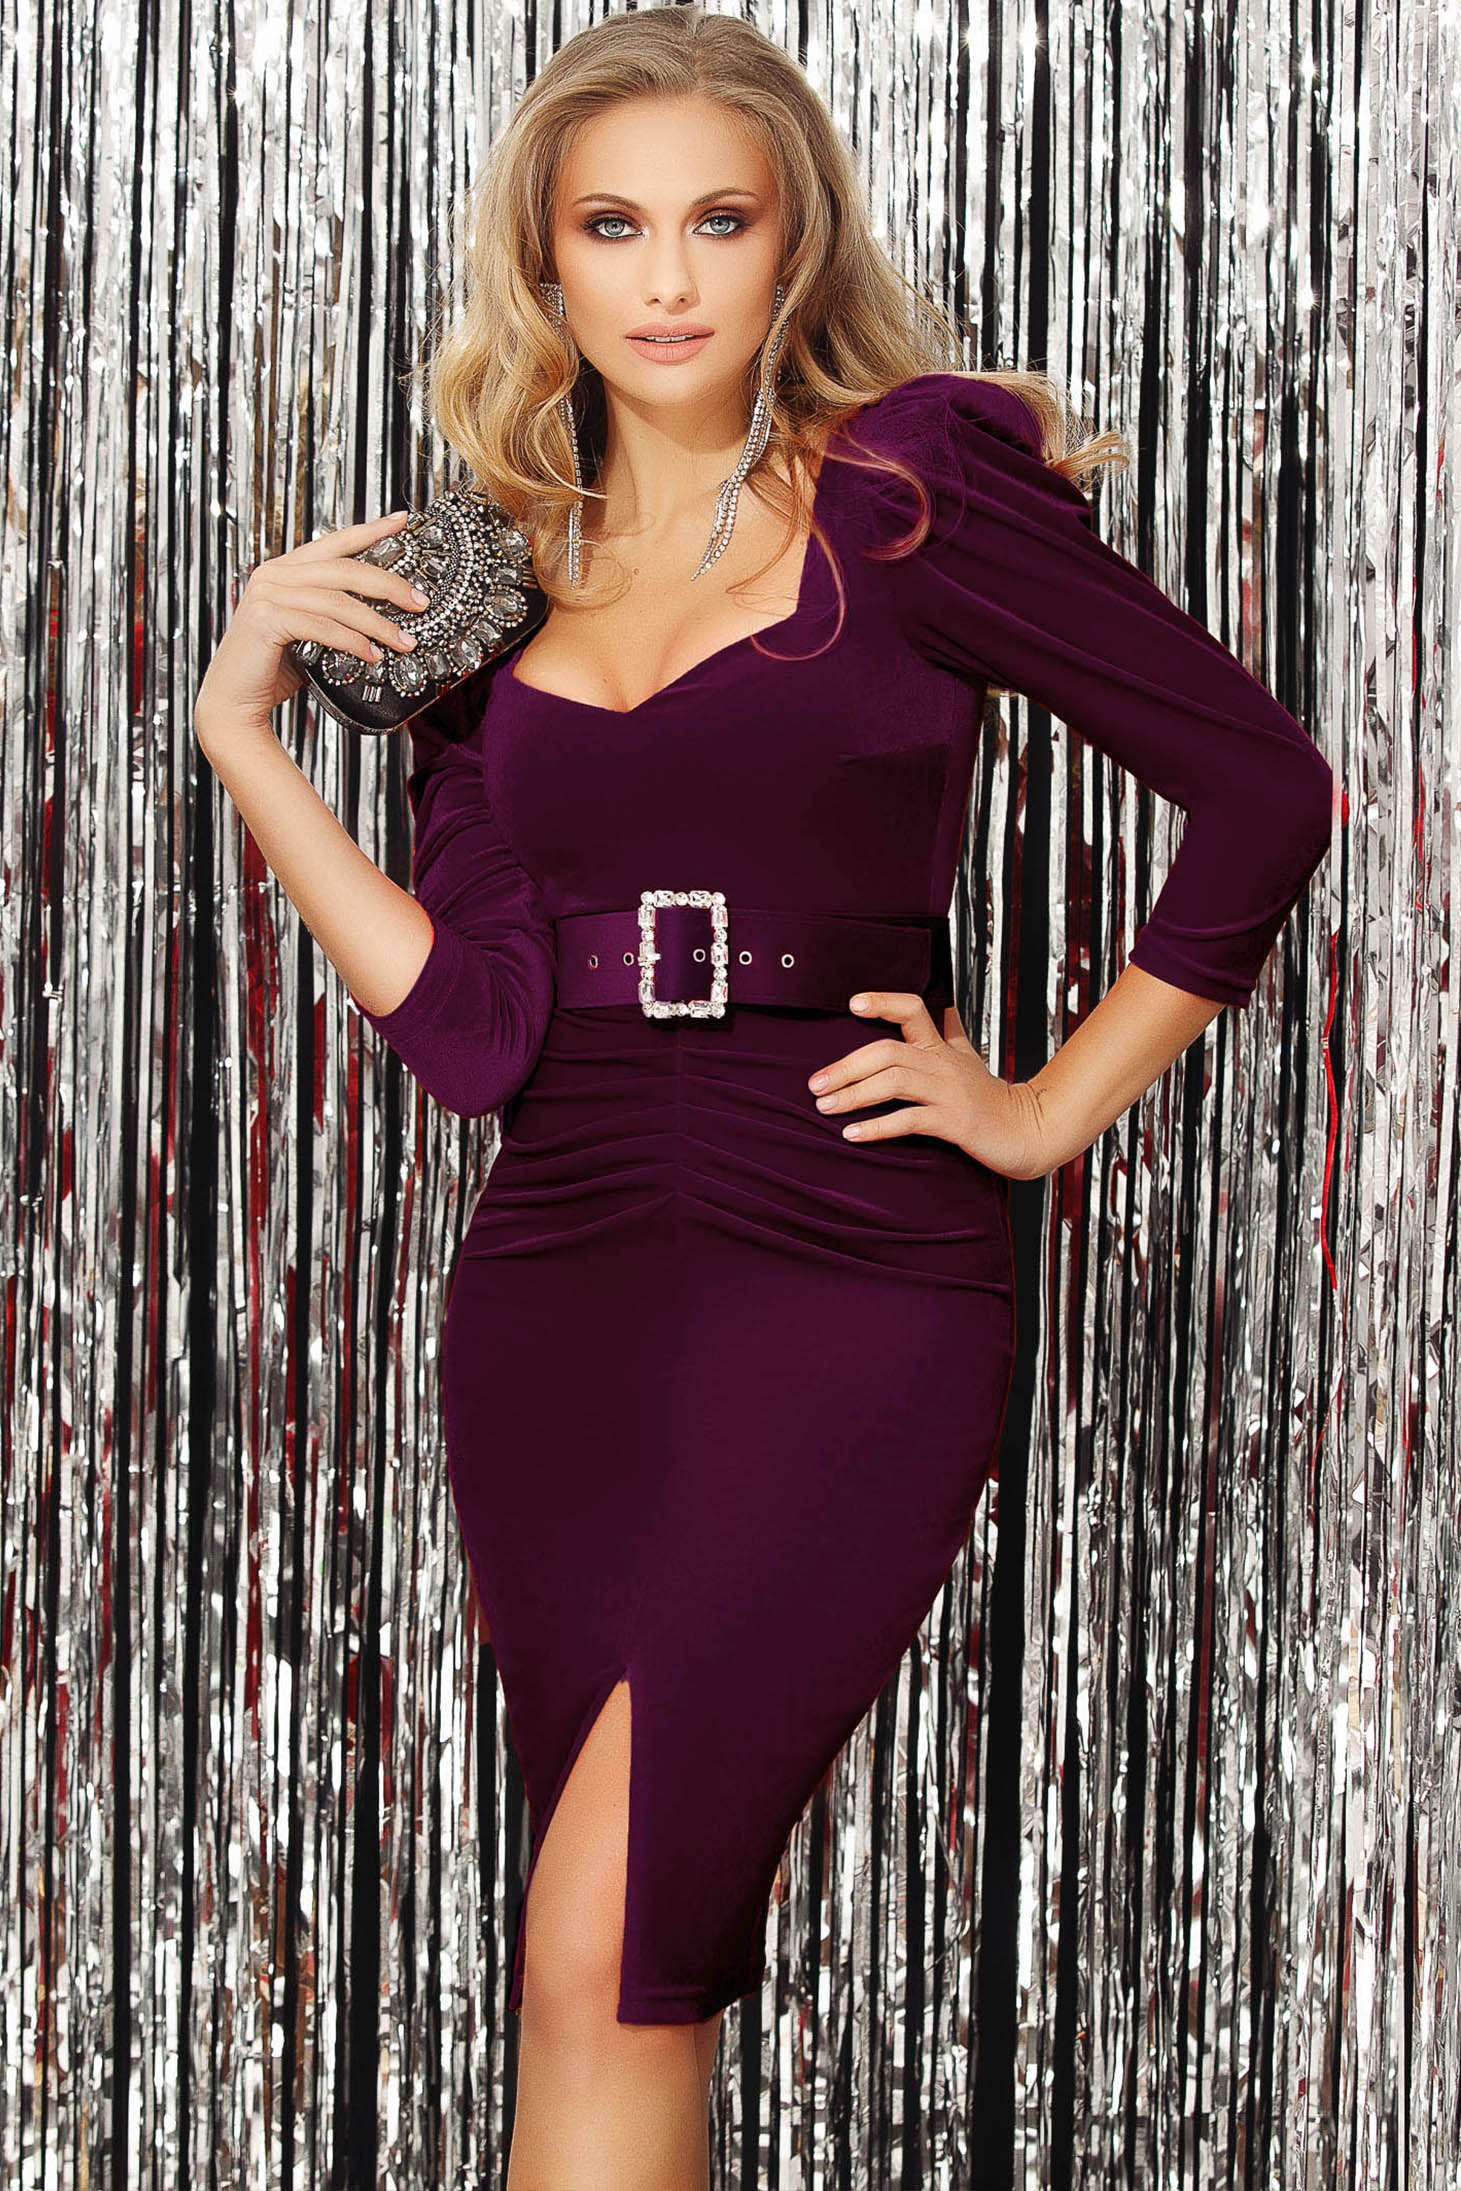 Purple dress occasional high shoulders with v-neckline with 3/4 sleeves slit velvet